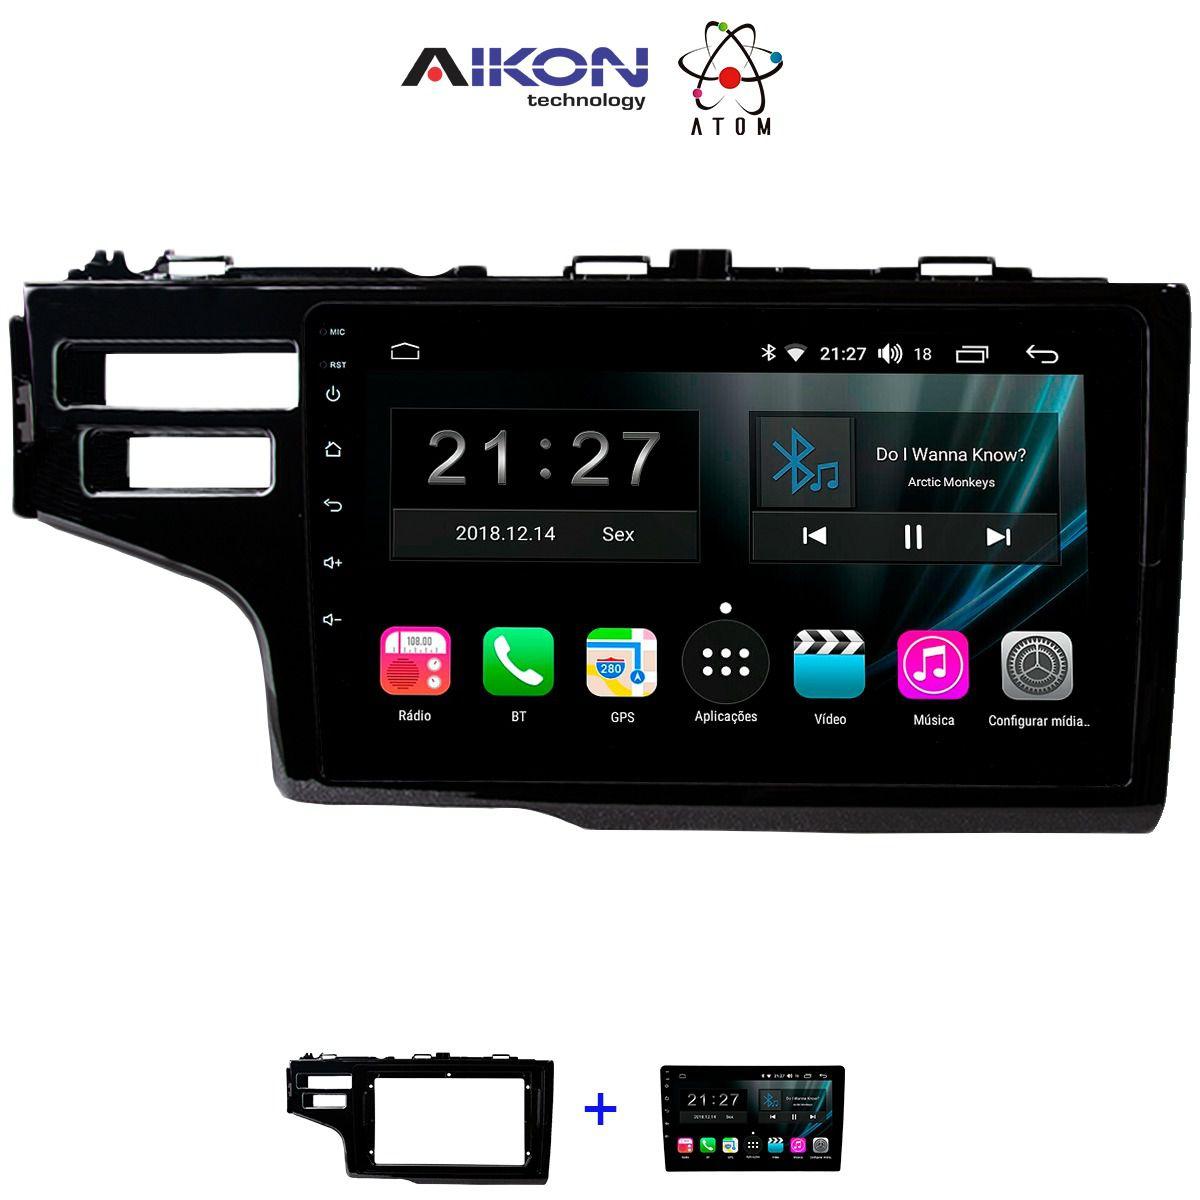 Central Multimidia Honda FIT 2019 Personal Aikon ATOM- Tela Tela 9 Polegadas - TV Digital FULL HD - GPS Bluetooth MP3 USB - 2 Câmera de Ré + Frontal - Sistema Android 8.1